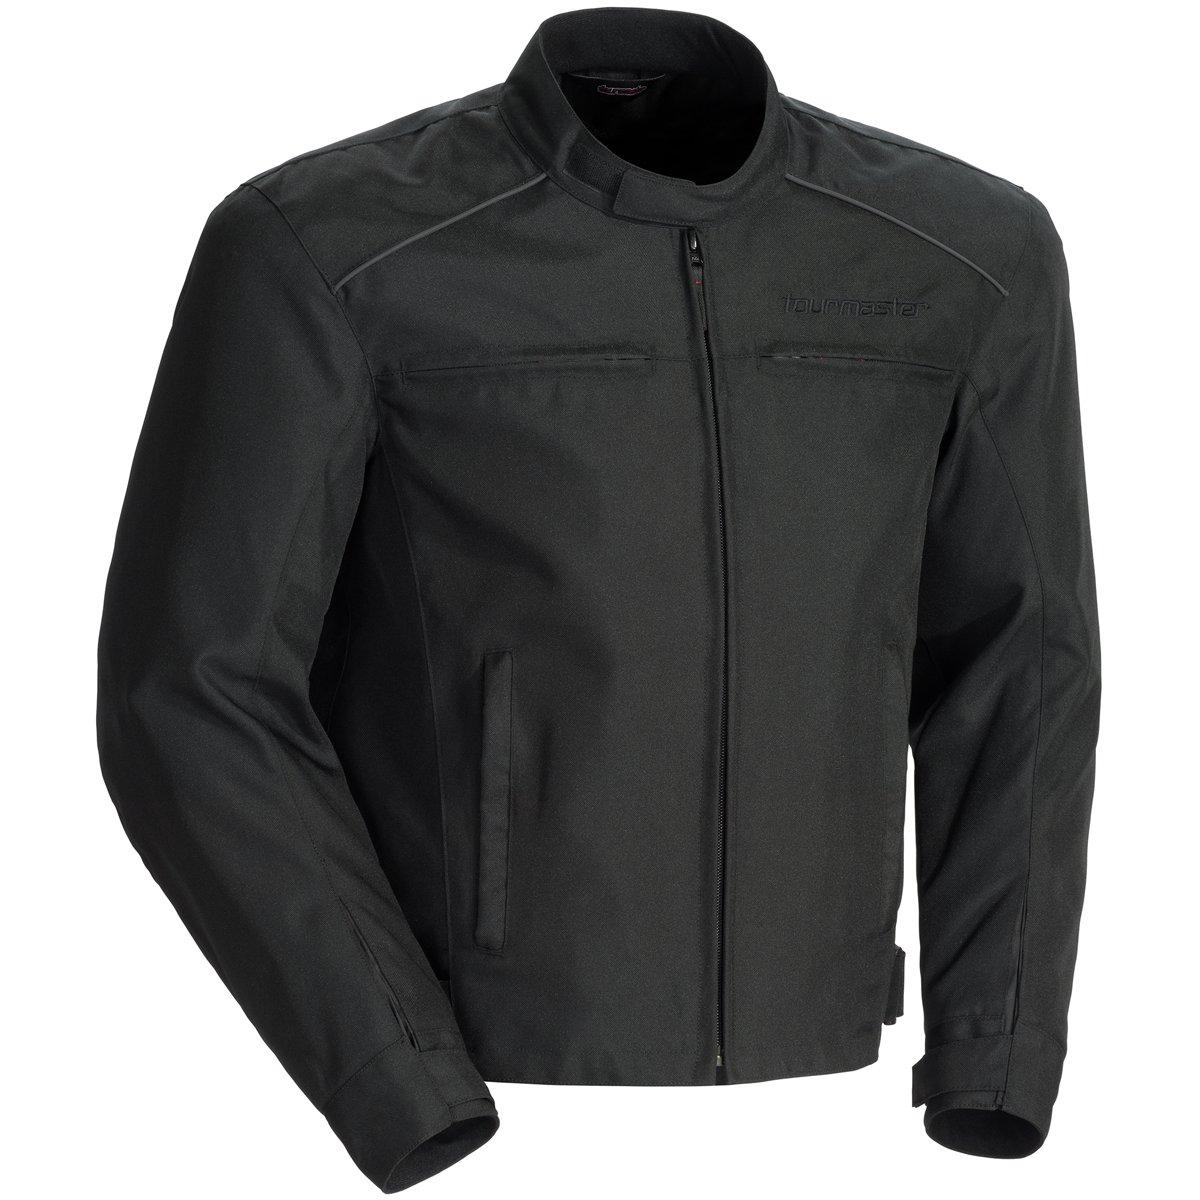 Tour Master Koraza Mens Textile Motorcycle Jacket - Black/Black / X-Large